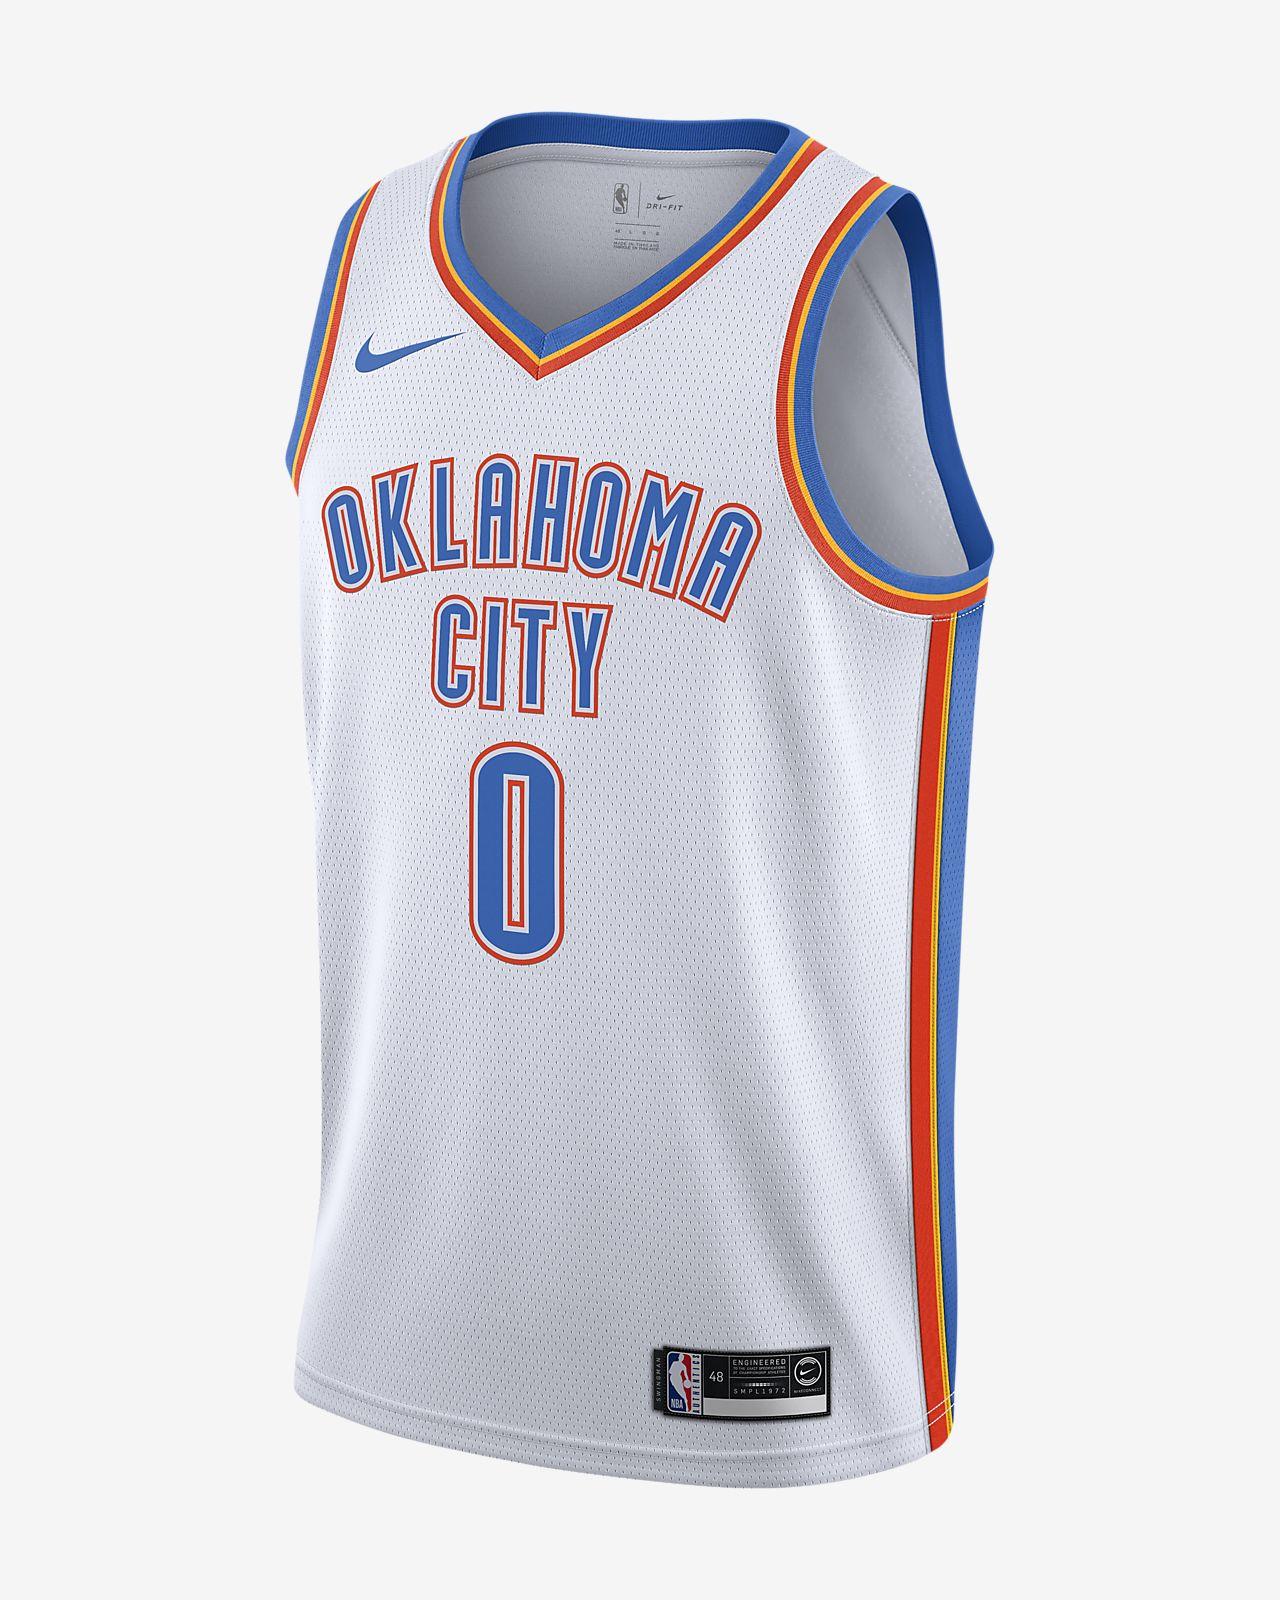 Maillot d'équipe Nike NBA Swingman Russell Westbrook Thunder Association Edition